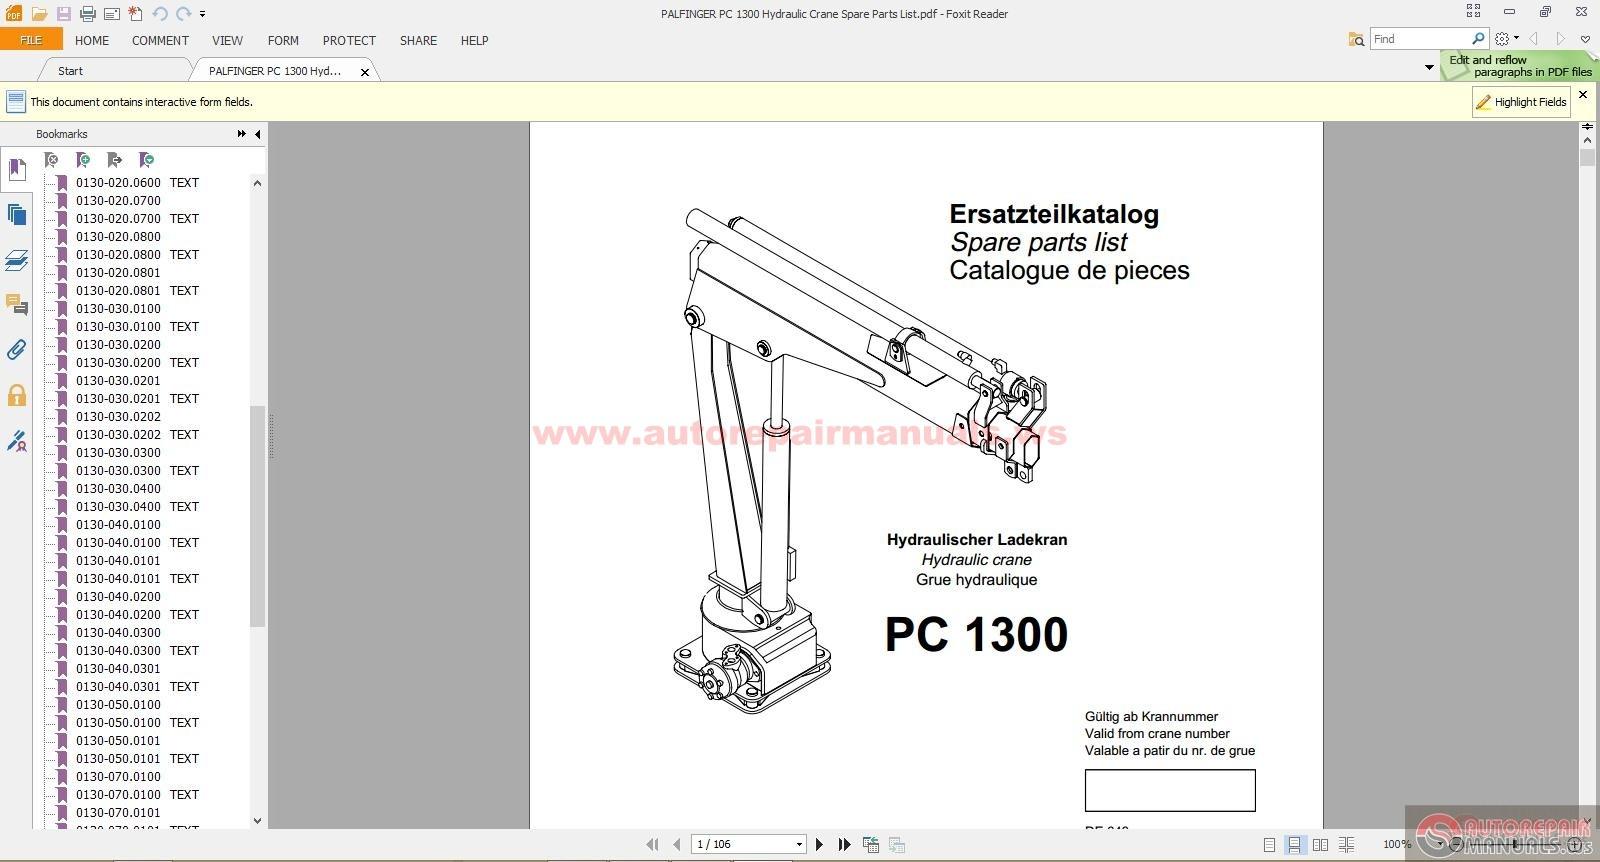 PALFINGER PC 1300 Hydraulic Crane Spare Parts List | Auto Repair Manual  Forum - Heavy Equipment Forums - Download Repair & Workshop ManualAutorepairmanuals.ws